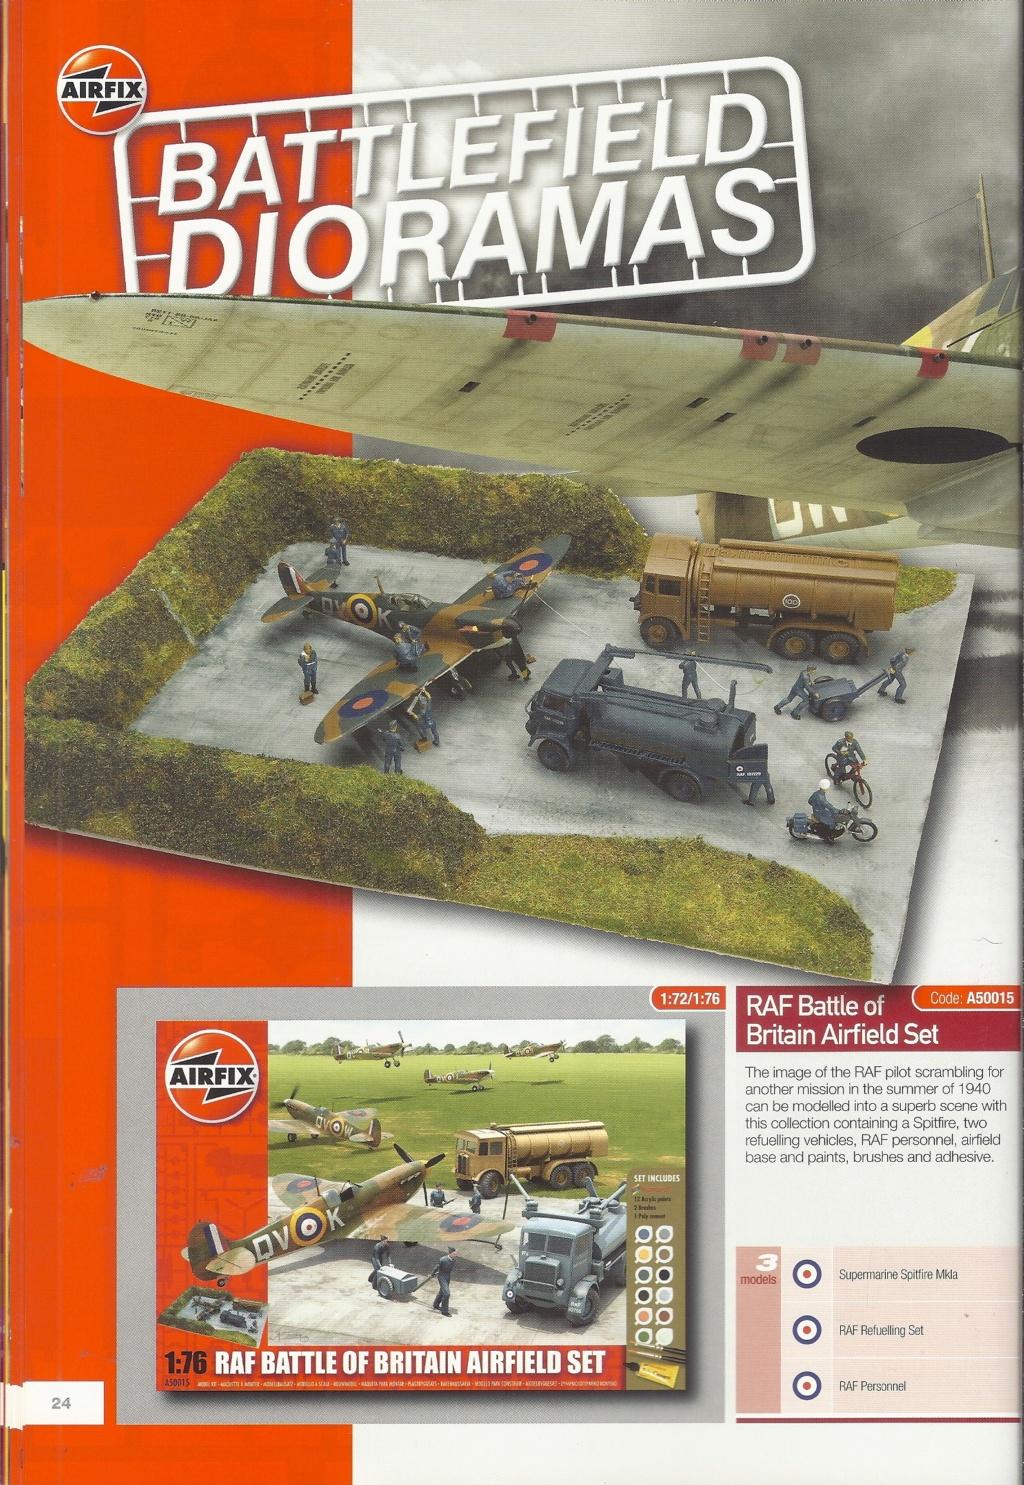 [AIRFIX 2013] Catalogue 2013 Airf1446